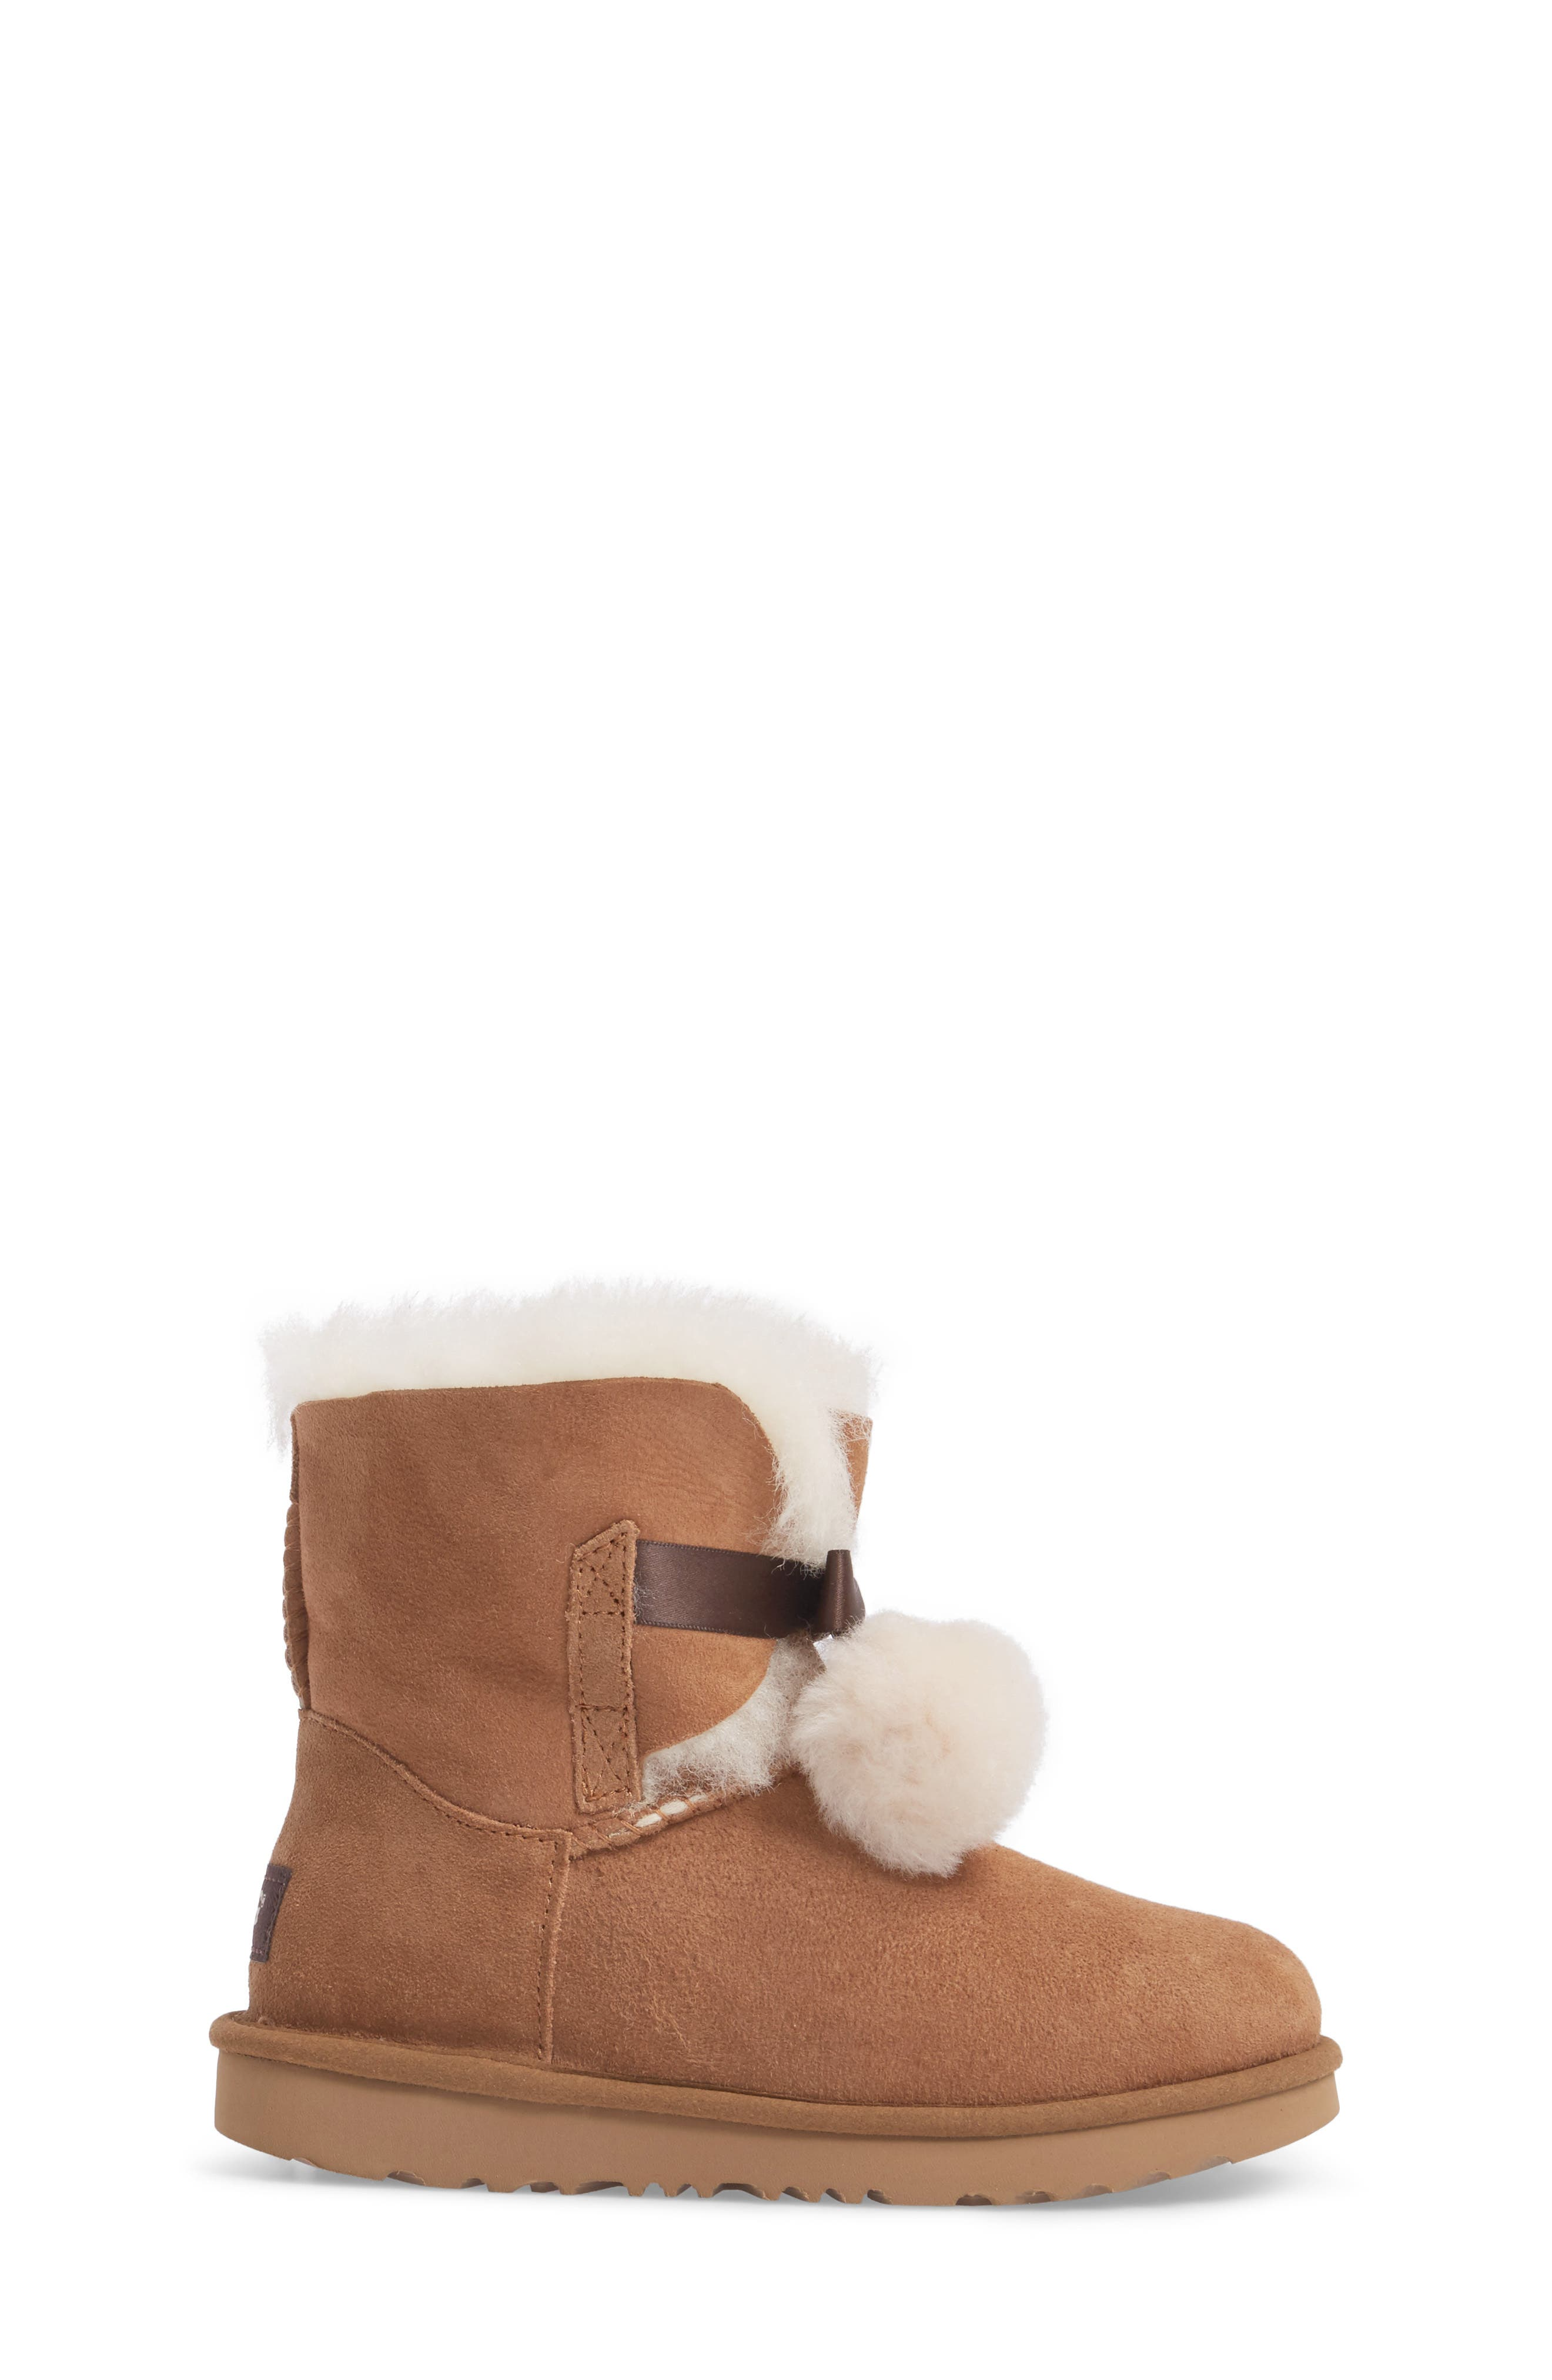 Gita Water-Resistant Genuine Shearling Pom Boot,                             Alternate thumbnail 3, color,                             CHESTNUT